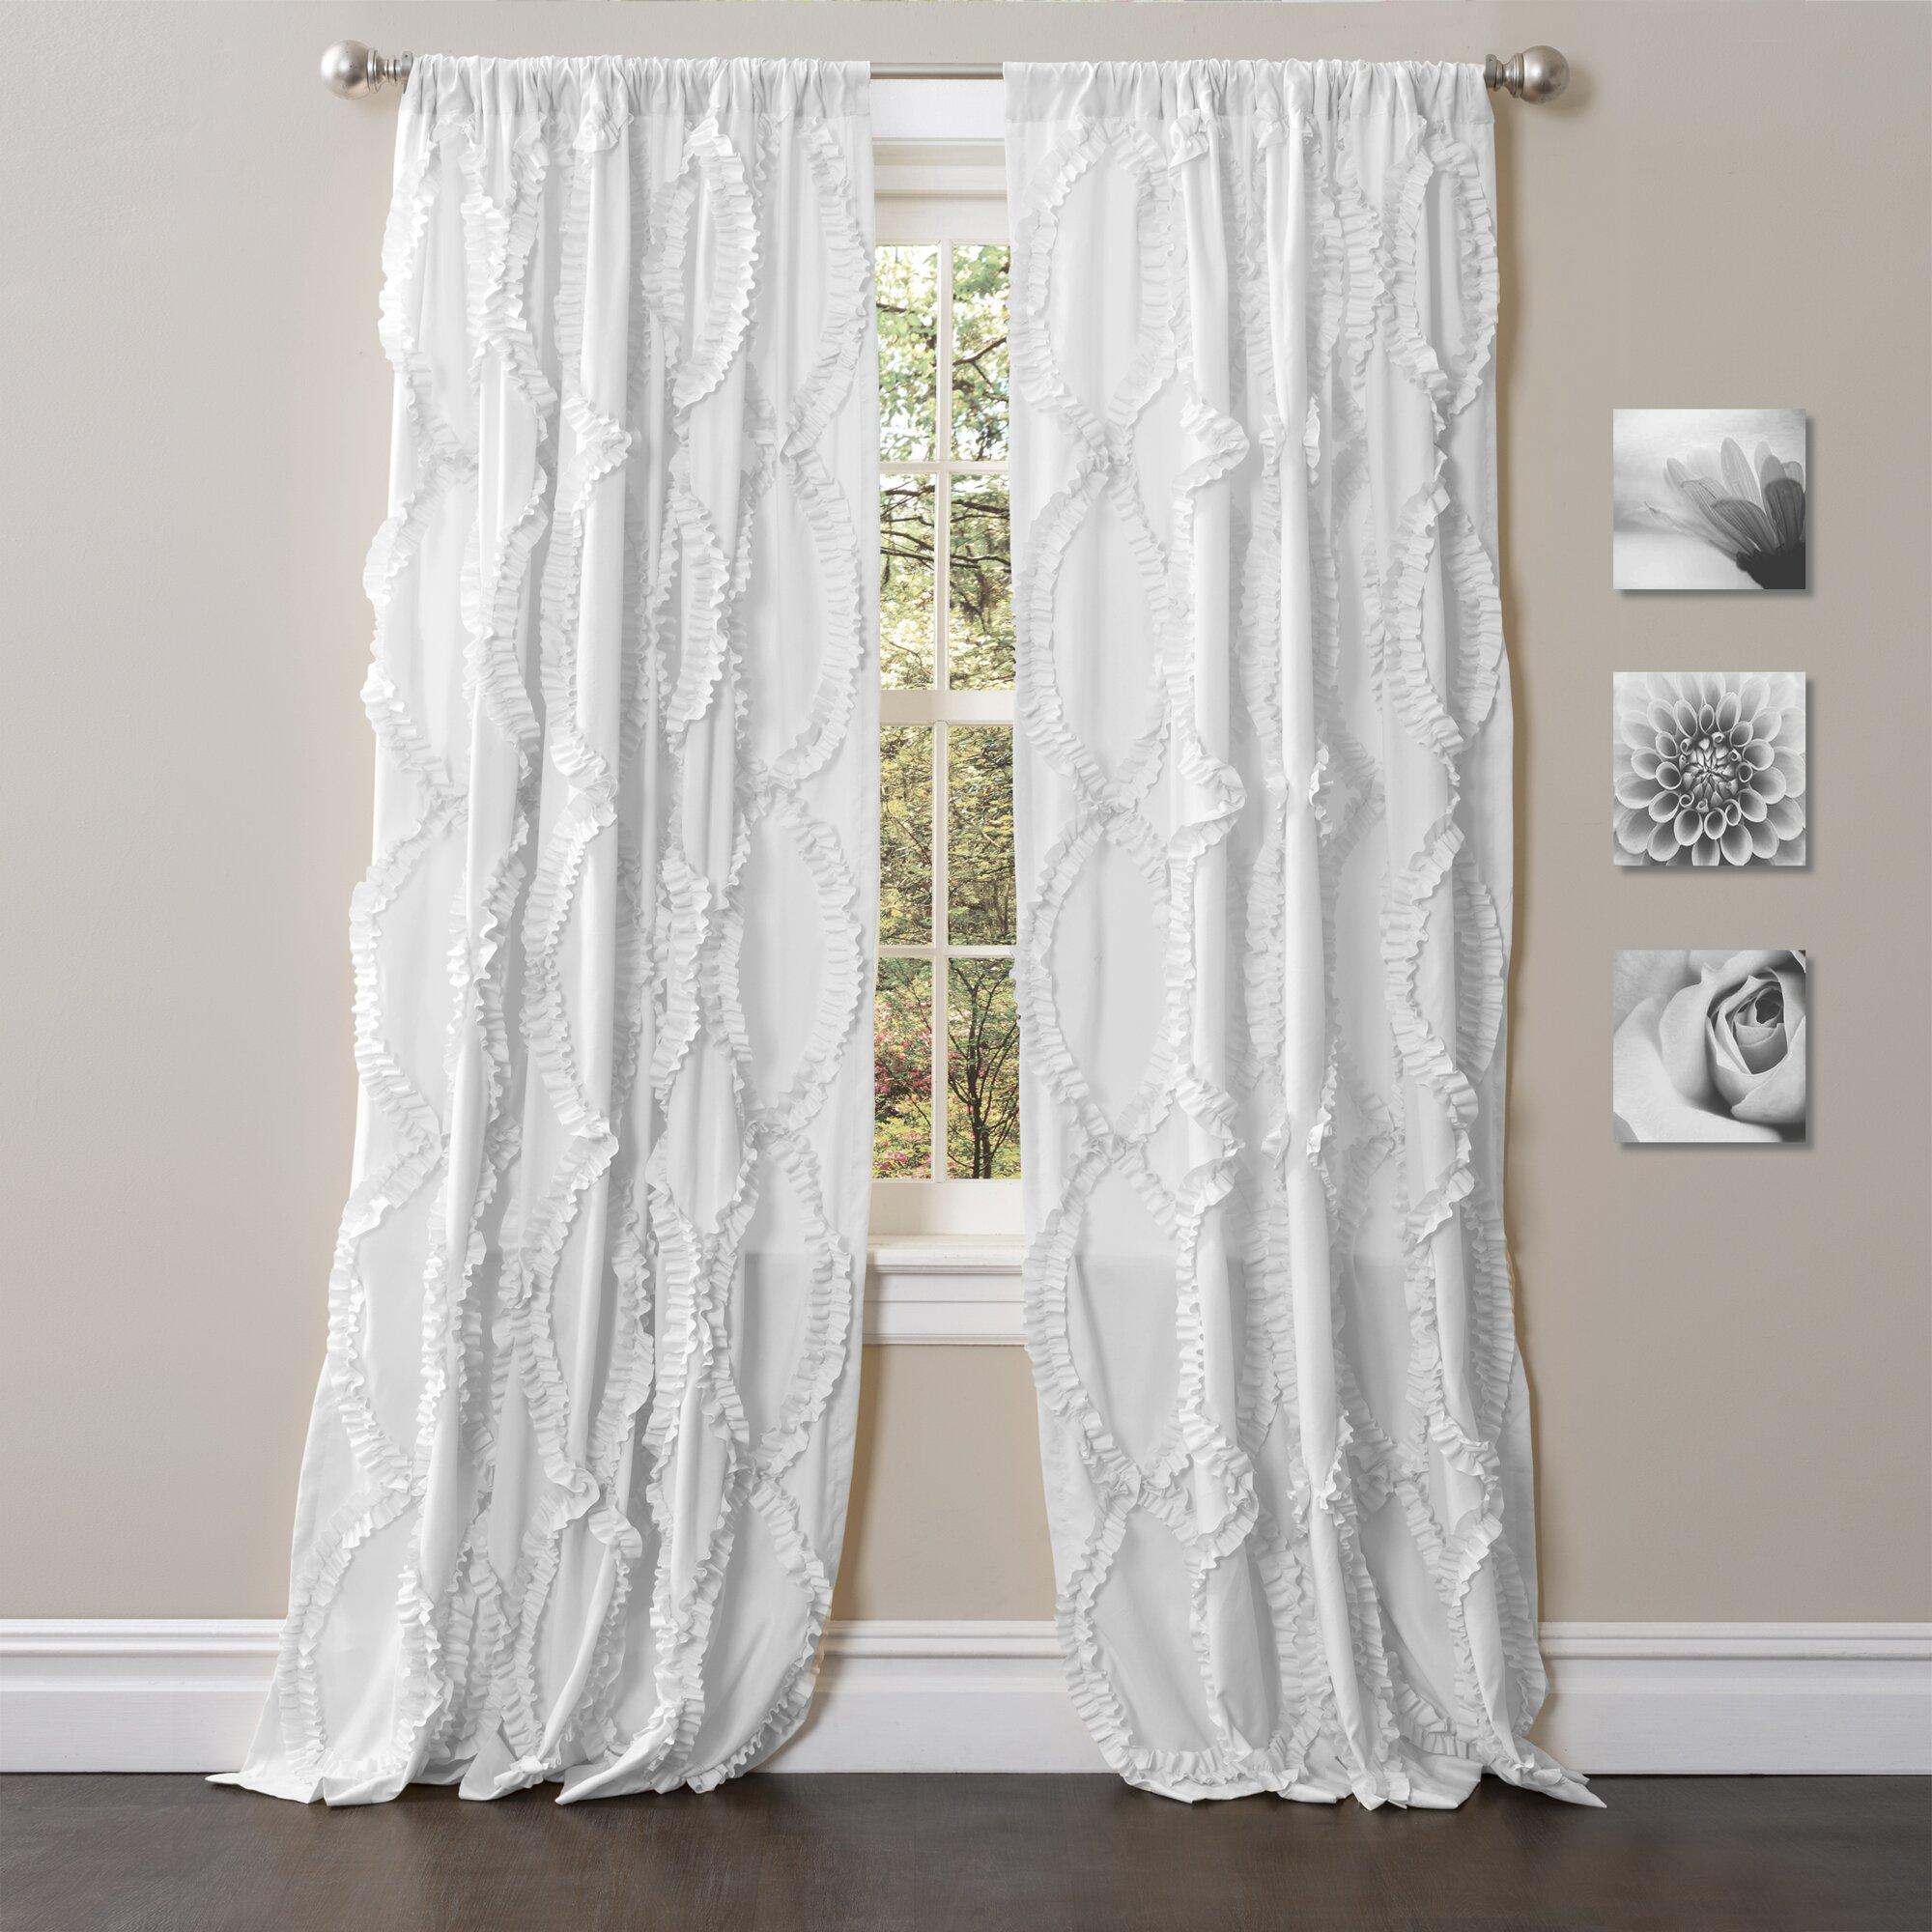 August Grove Eileen Light Filtering Single Curtain Panel